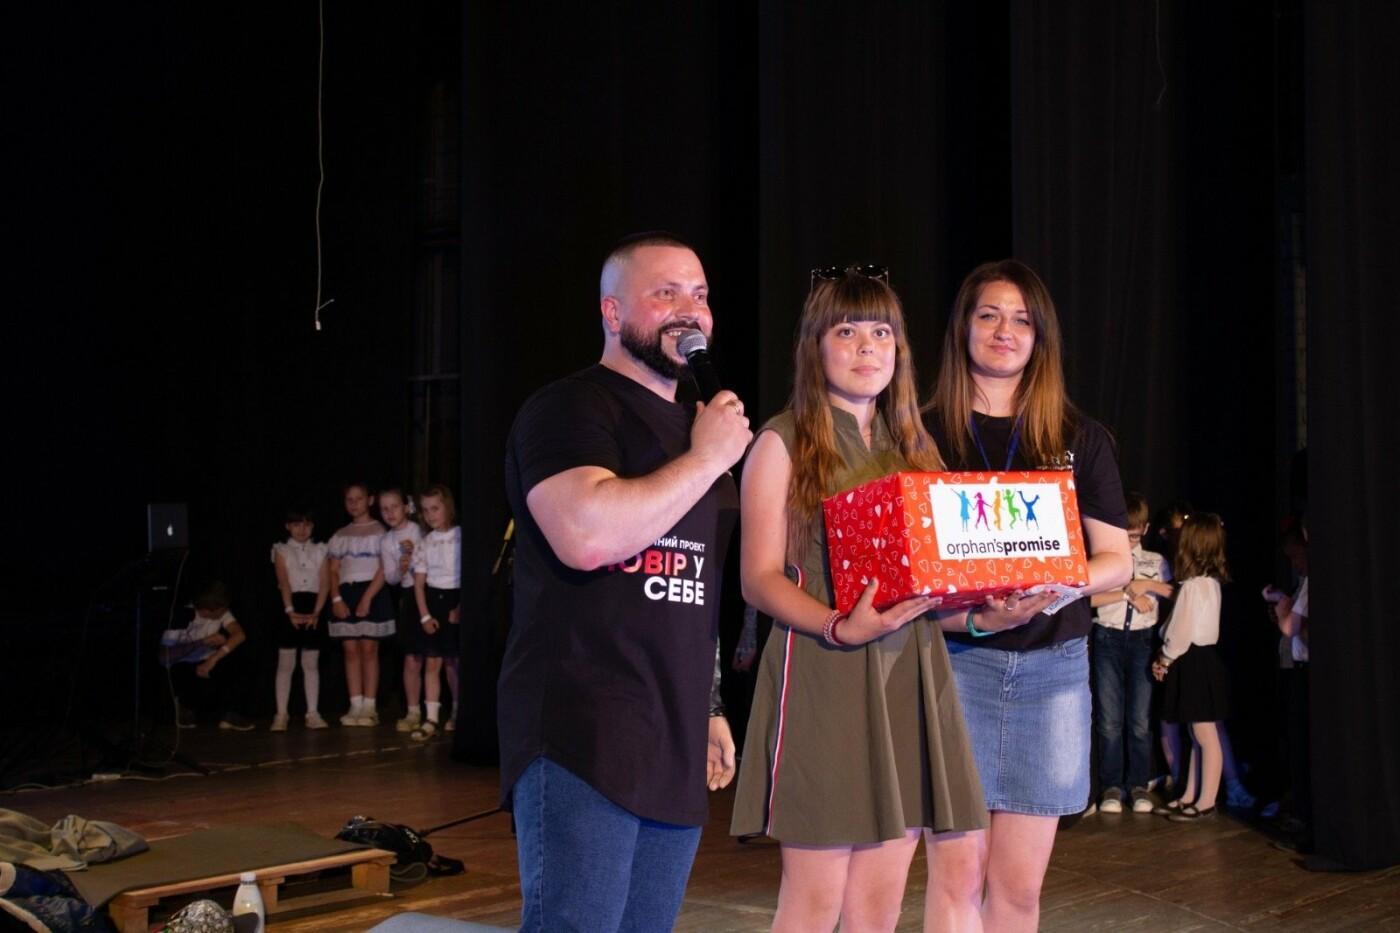 «Поверь в себя»: в Бердянске посвятили концерт проблемам молодежи, фото-6